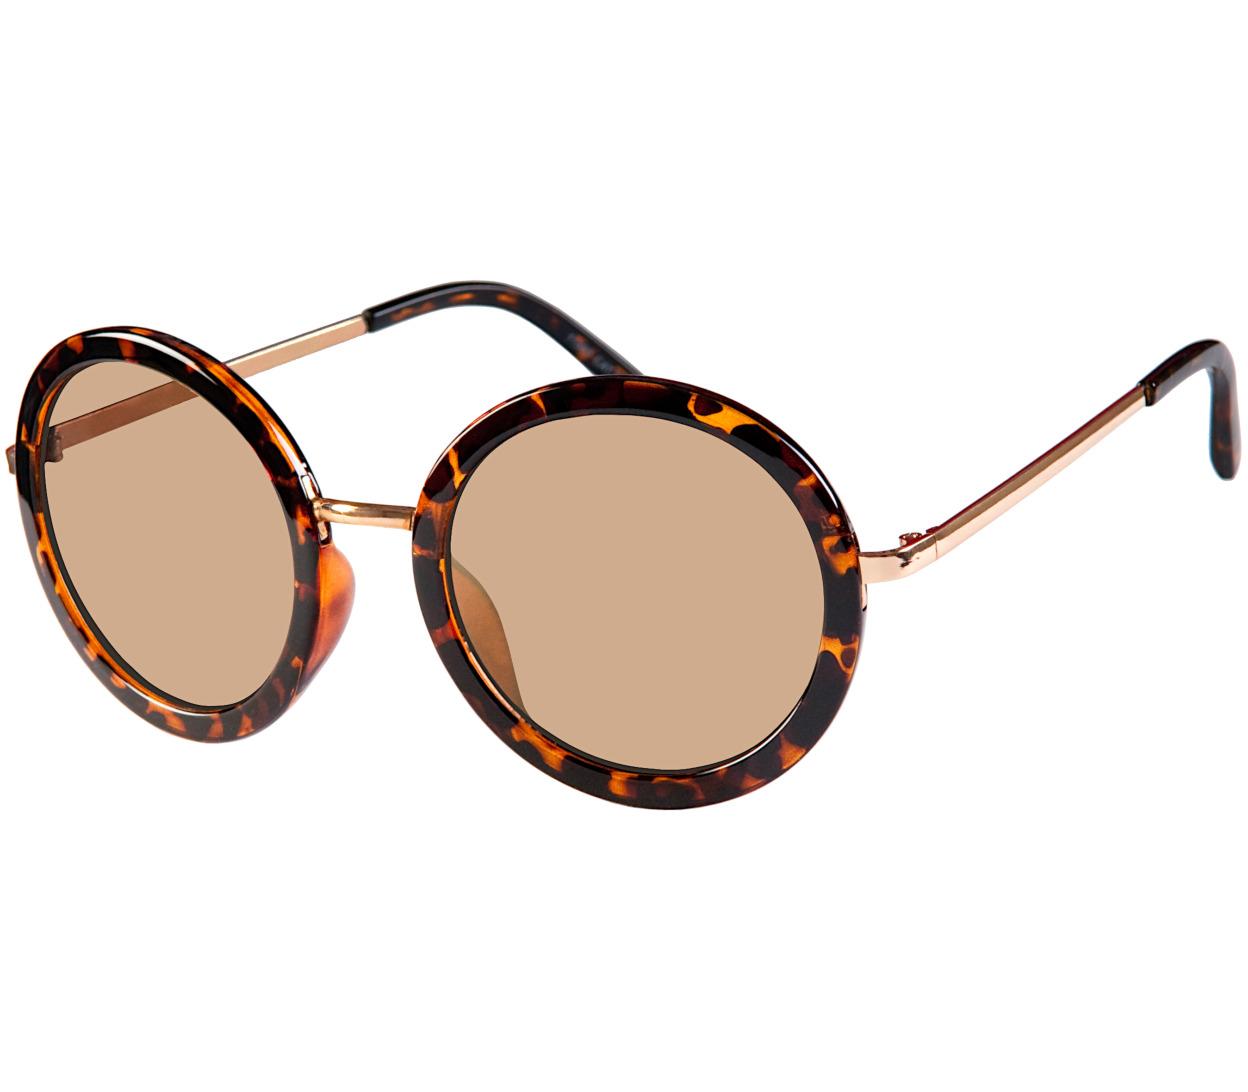 Main Image (Angle) - Rose (Tortoiseshell) Retro Sunglasses